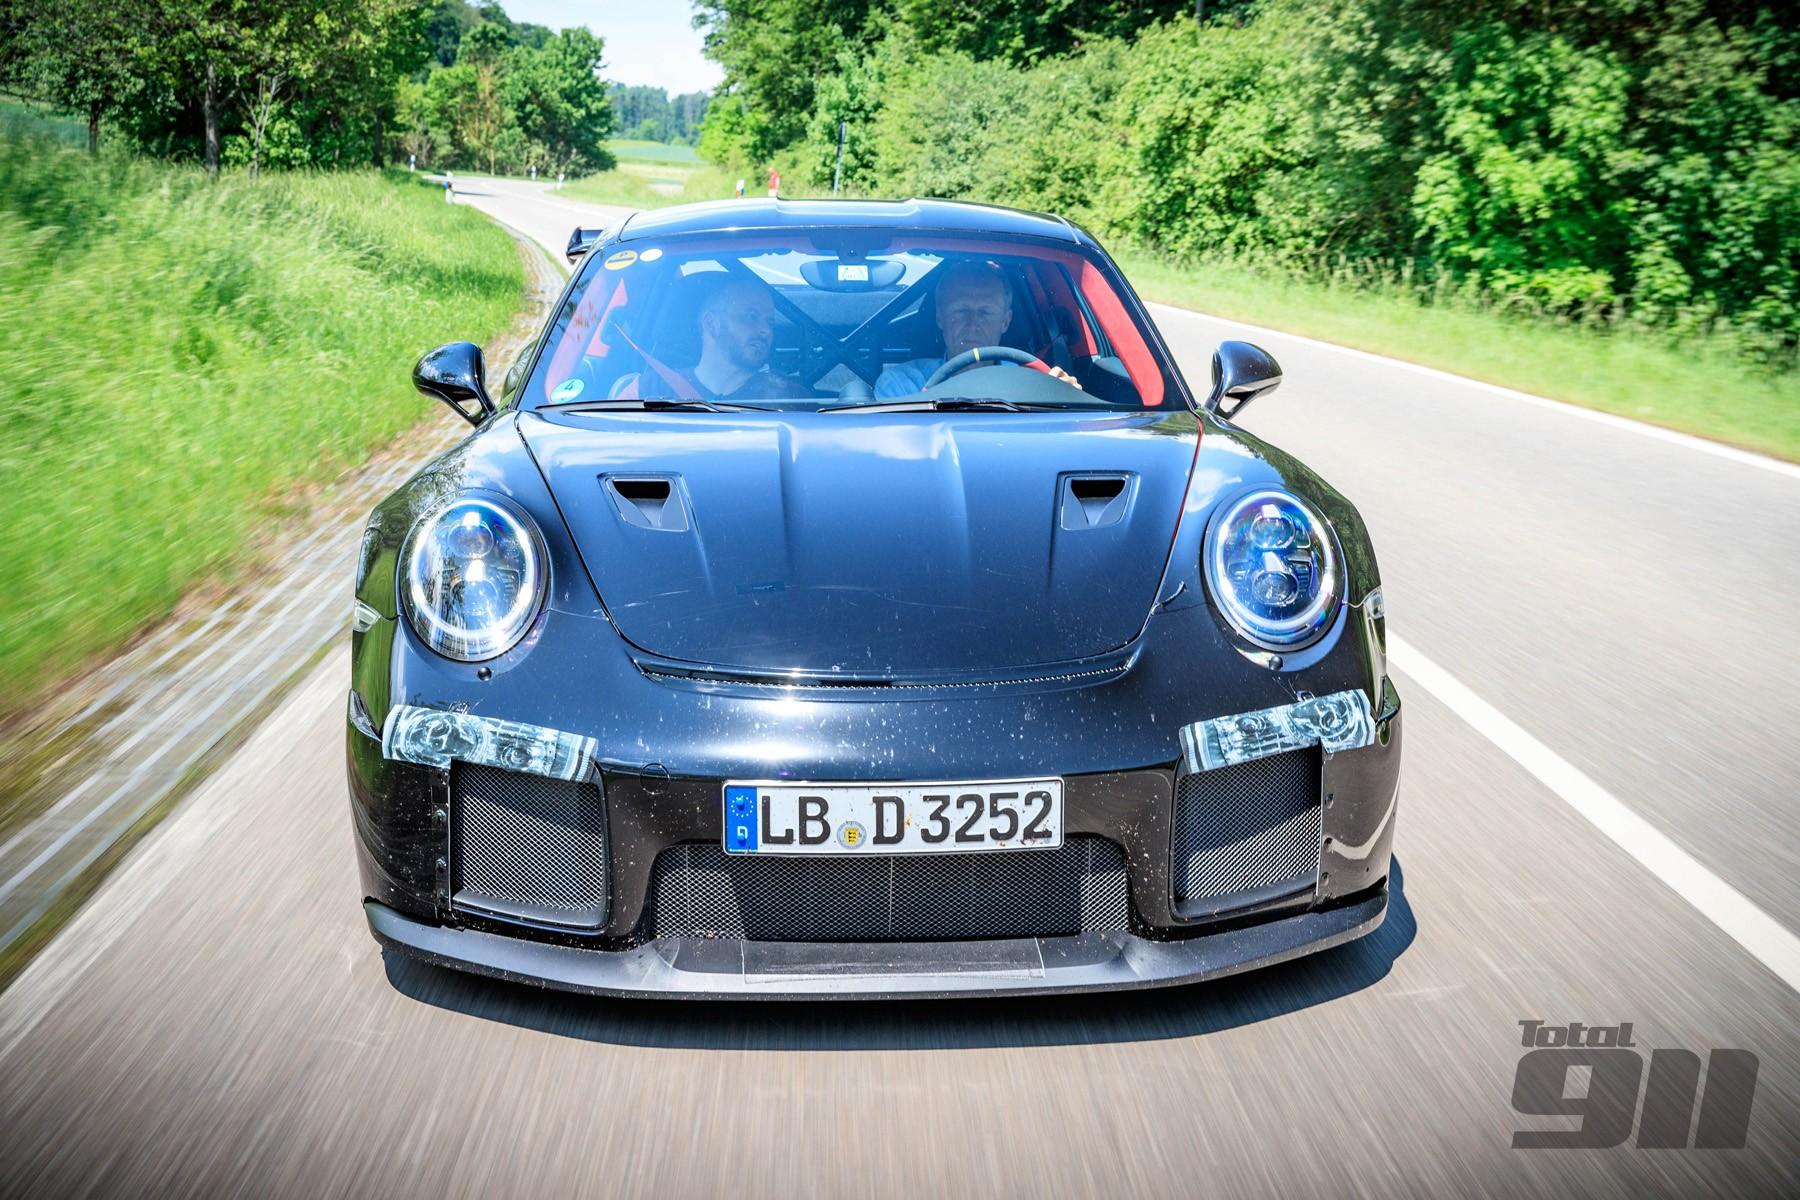 2018-porsche-911-gt2-rs-prototype-drive-reveals-spray-cooled-38l-boxer-7m-ring_1 Wonderful Porsche 911 Gt2 Rs Review Cars Trend